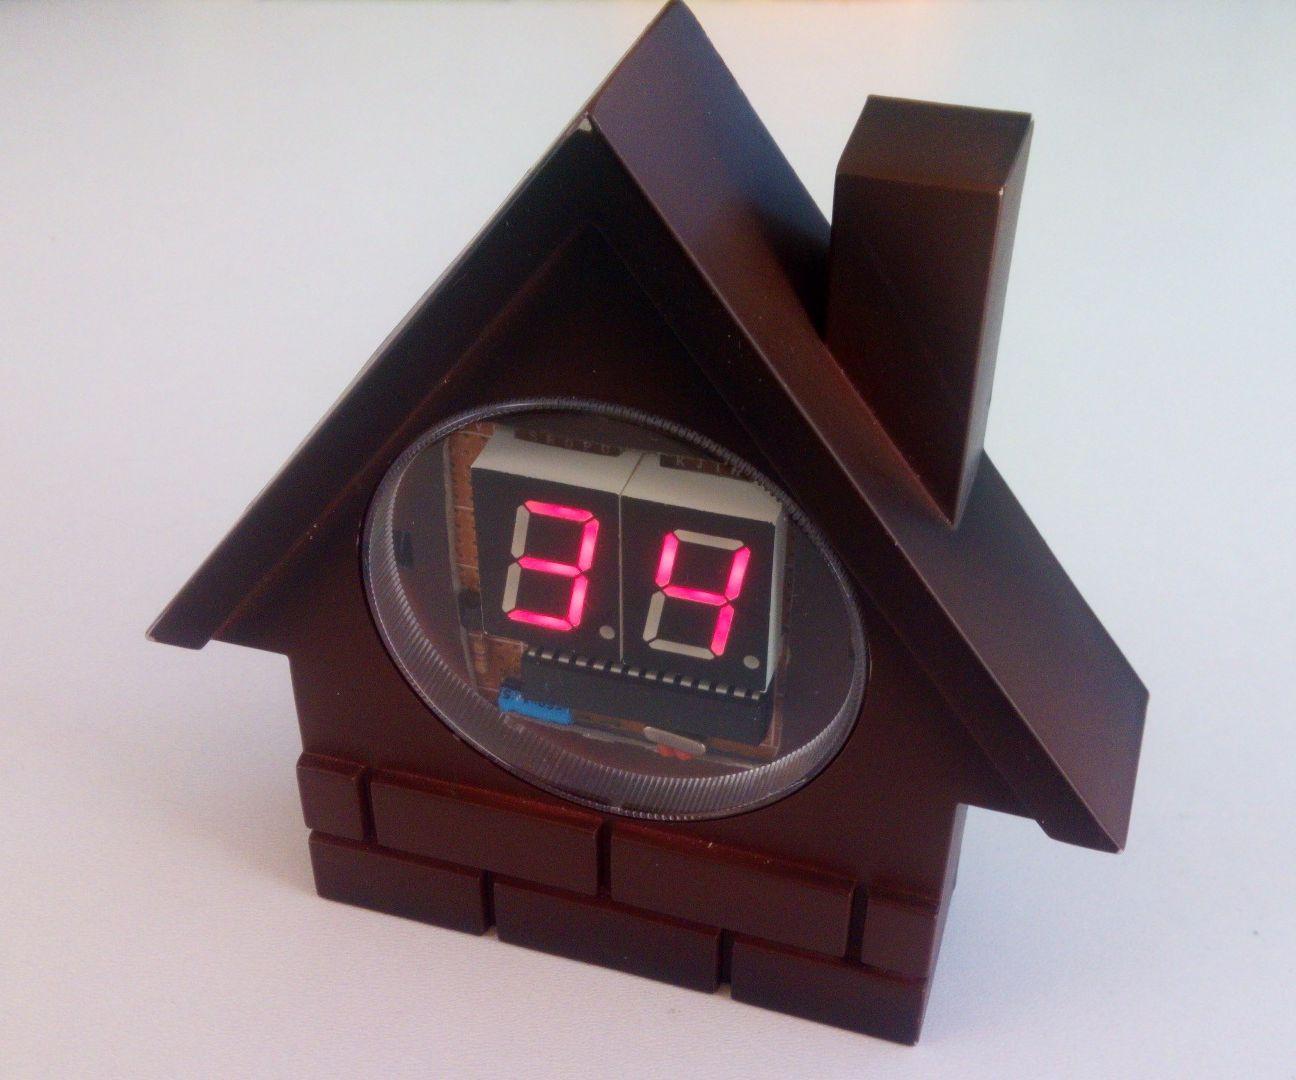 Seven Segment Display Thermometer - Arduino Based